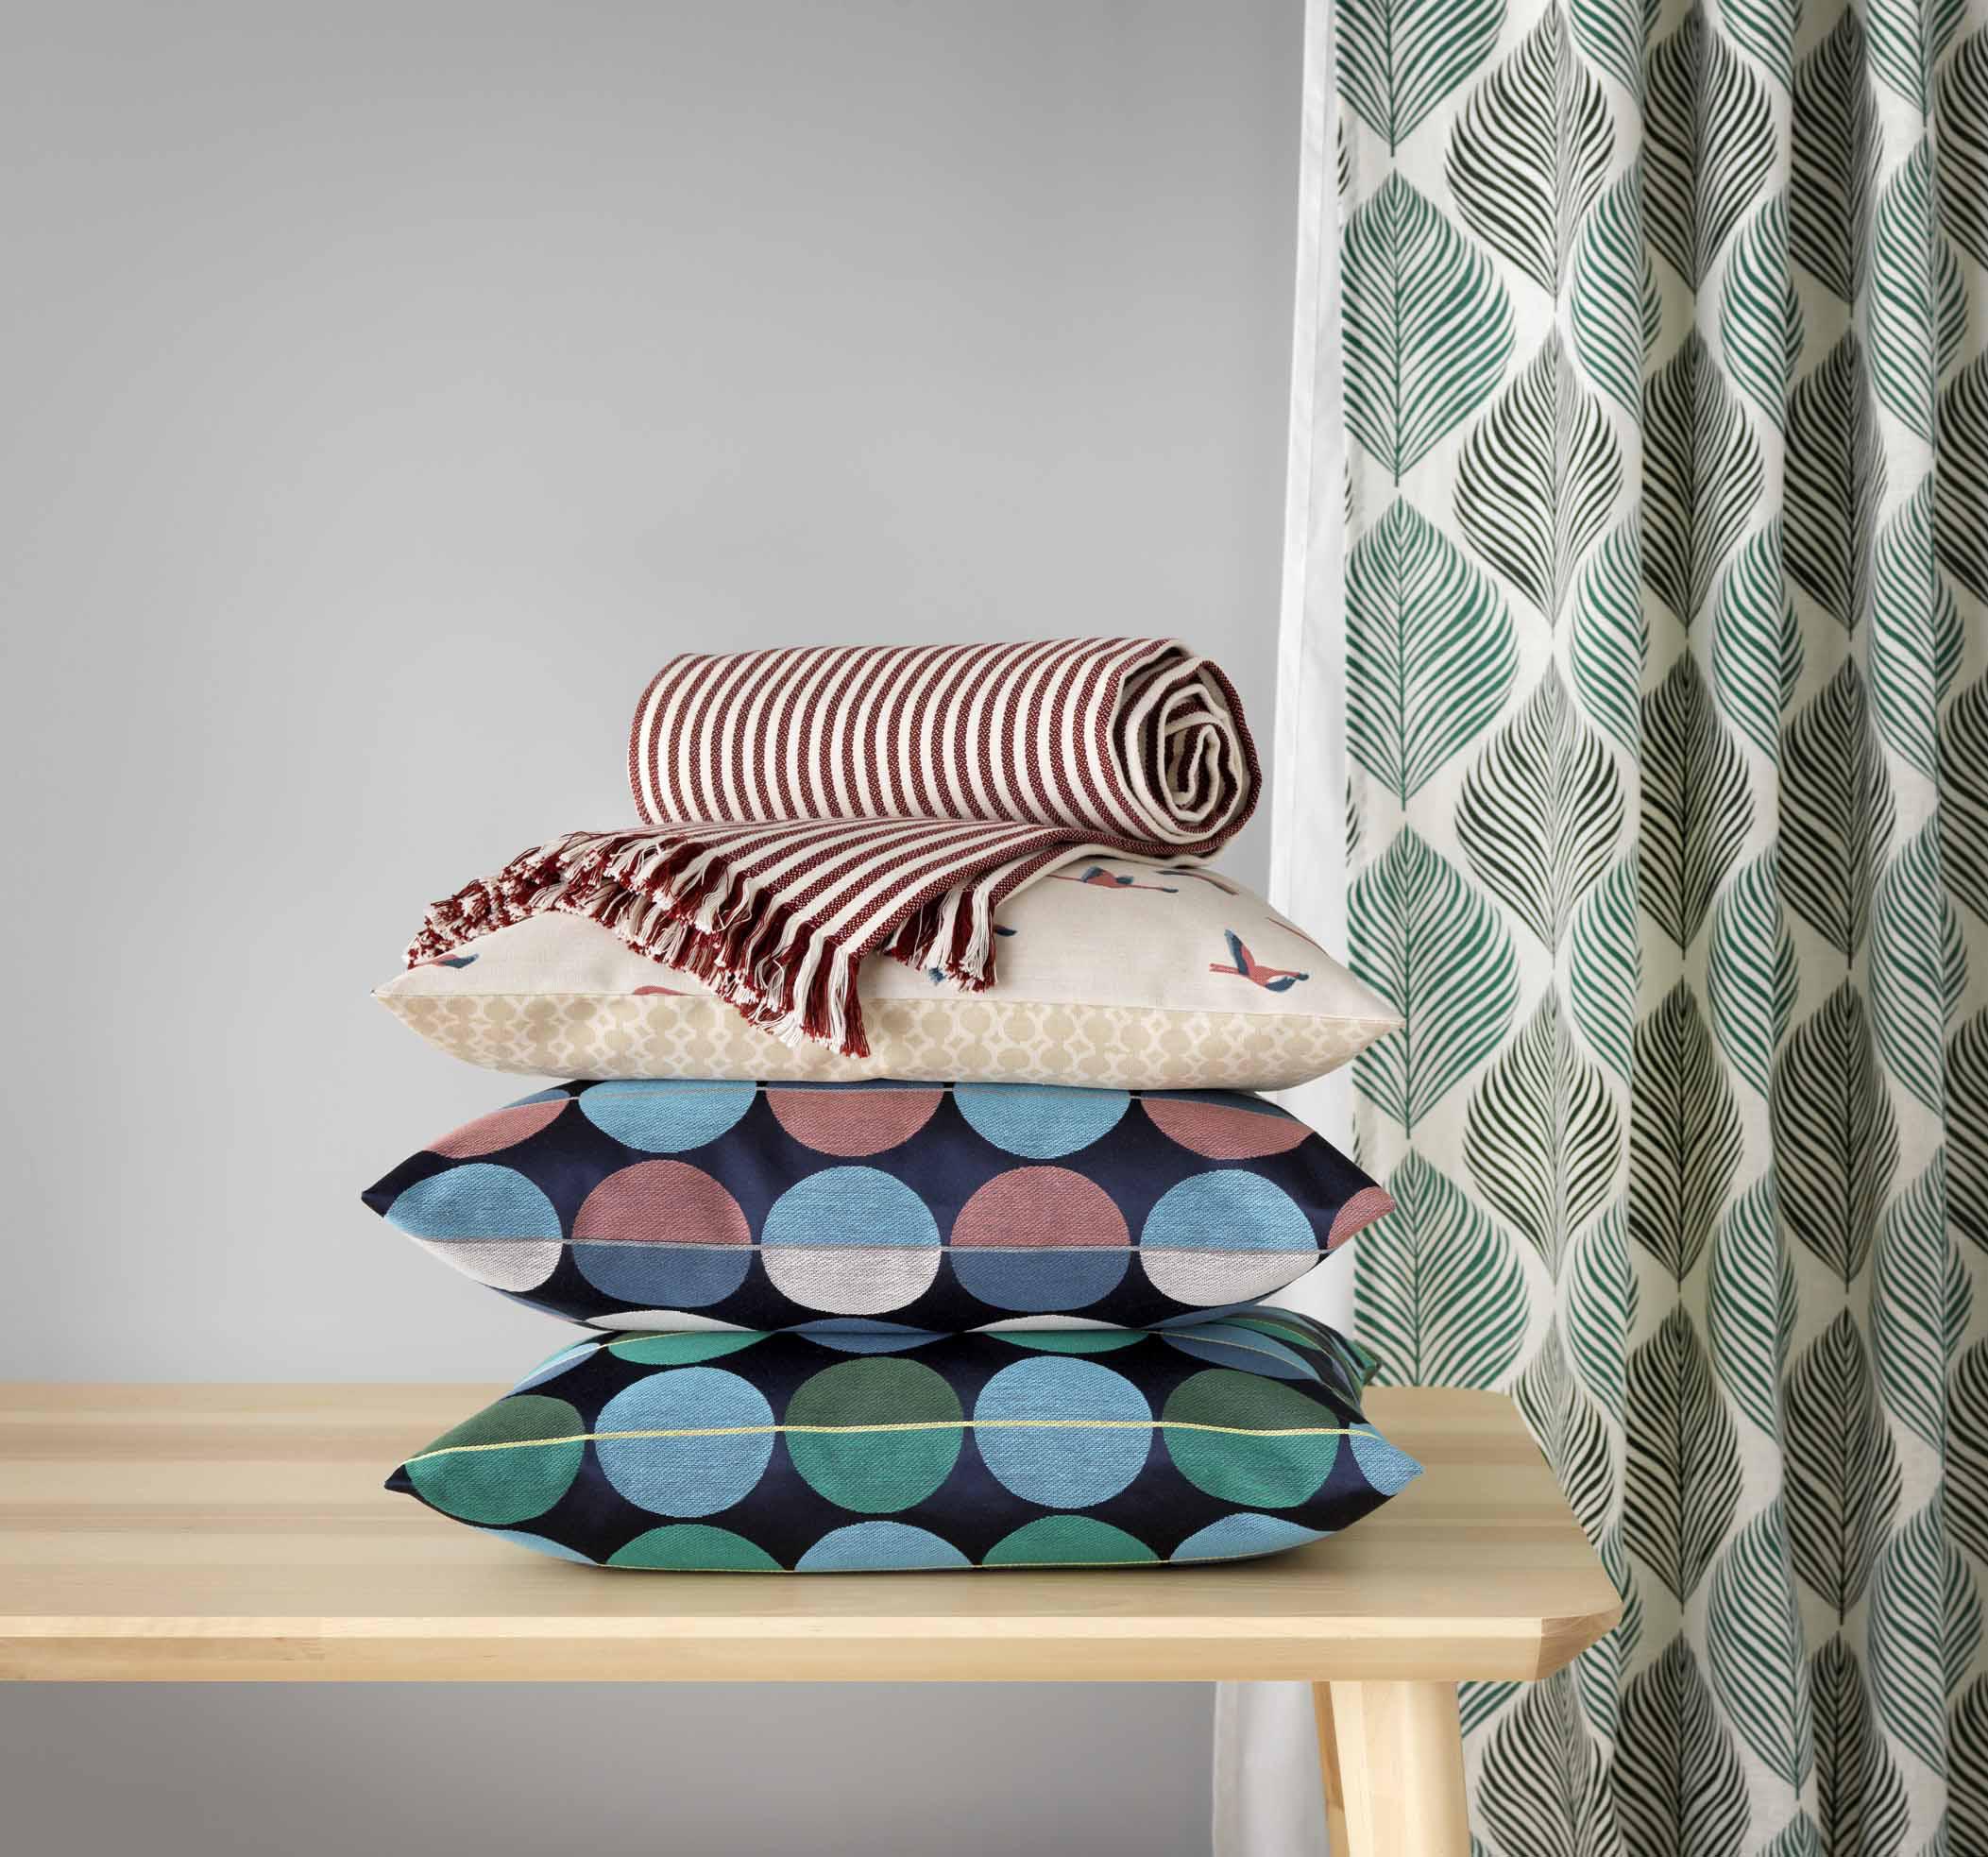 MAJBRITT Cushion Cover - $6.99 - IKEA